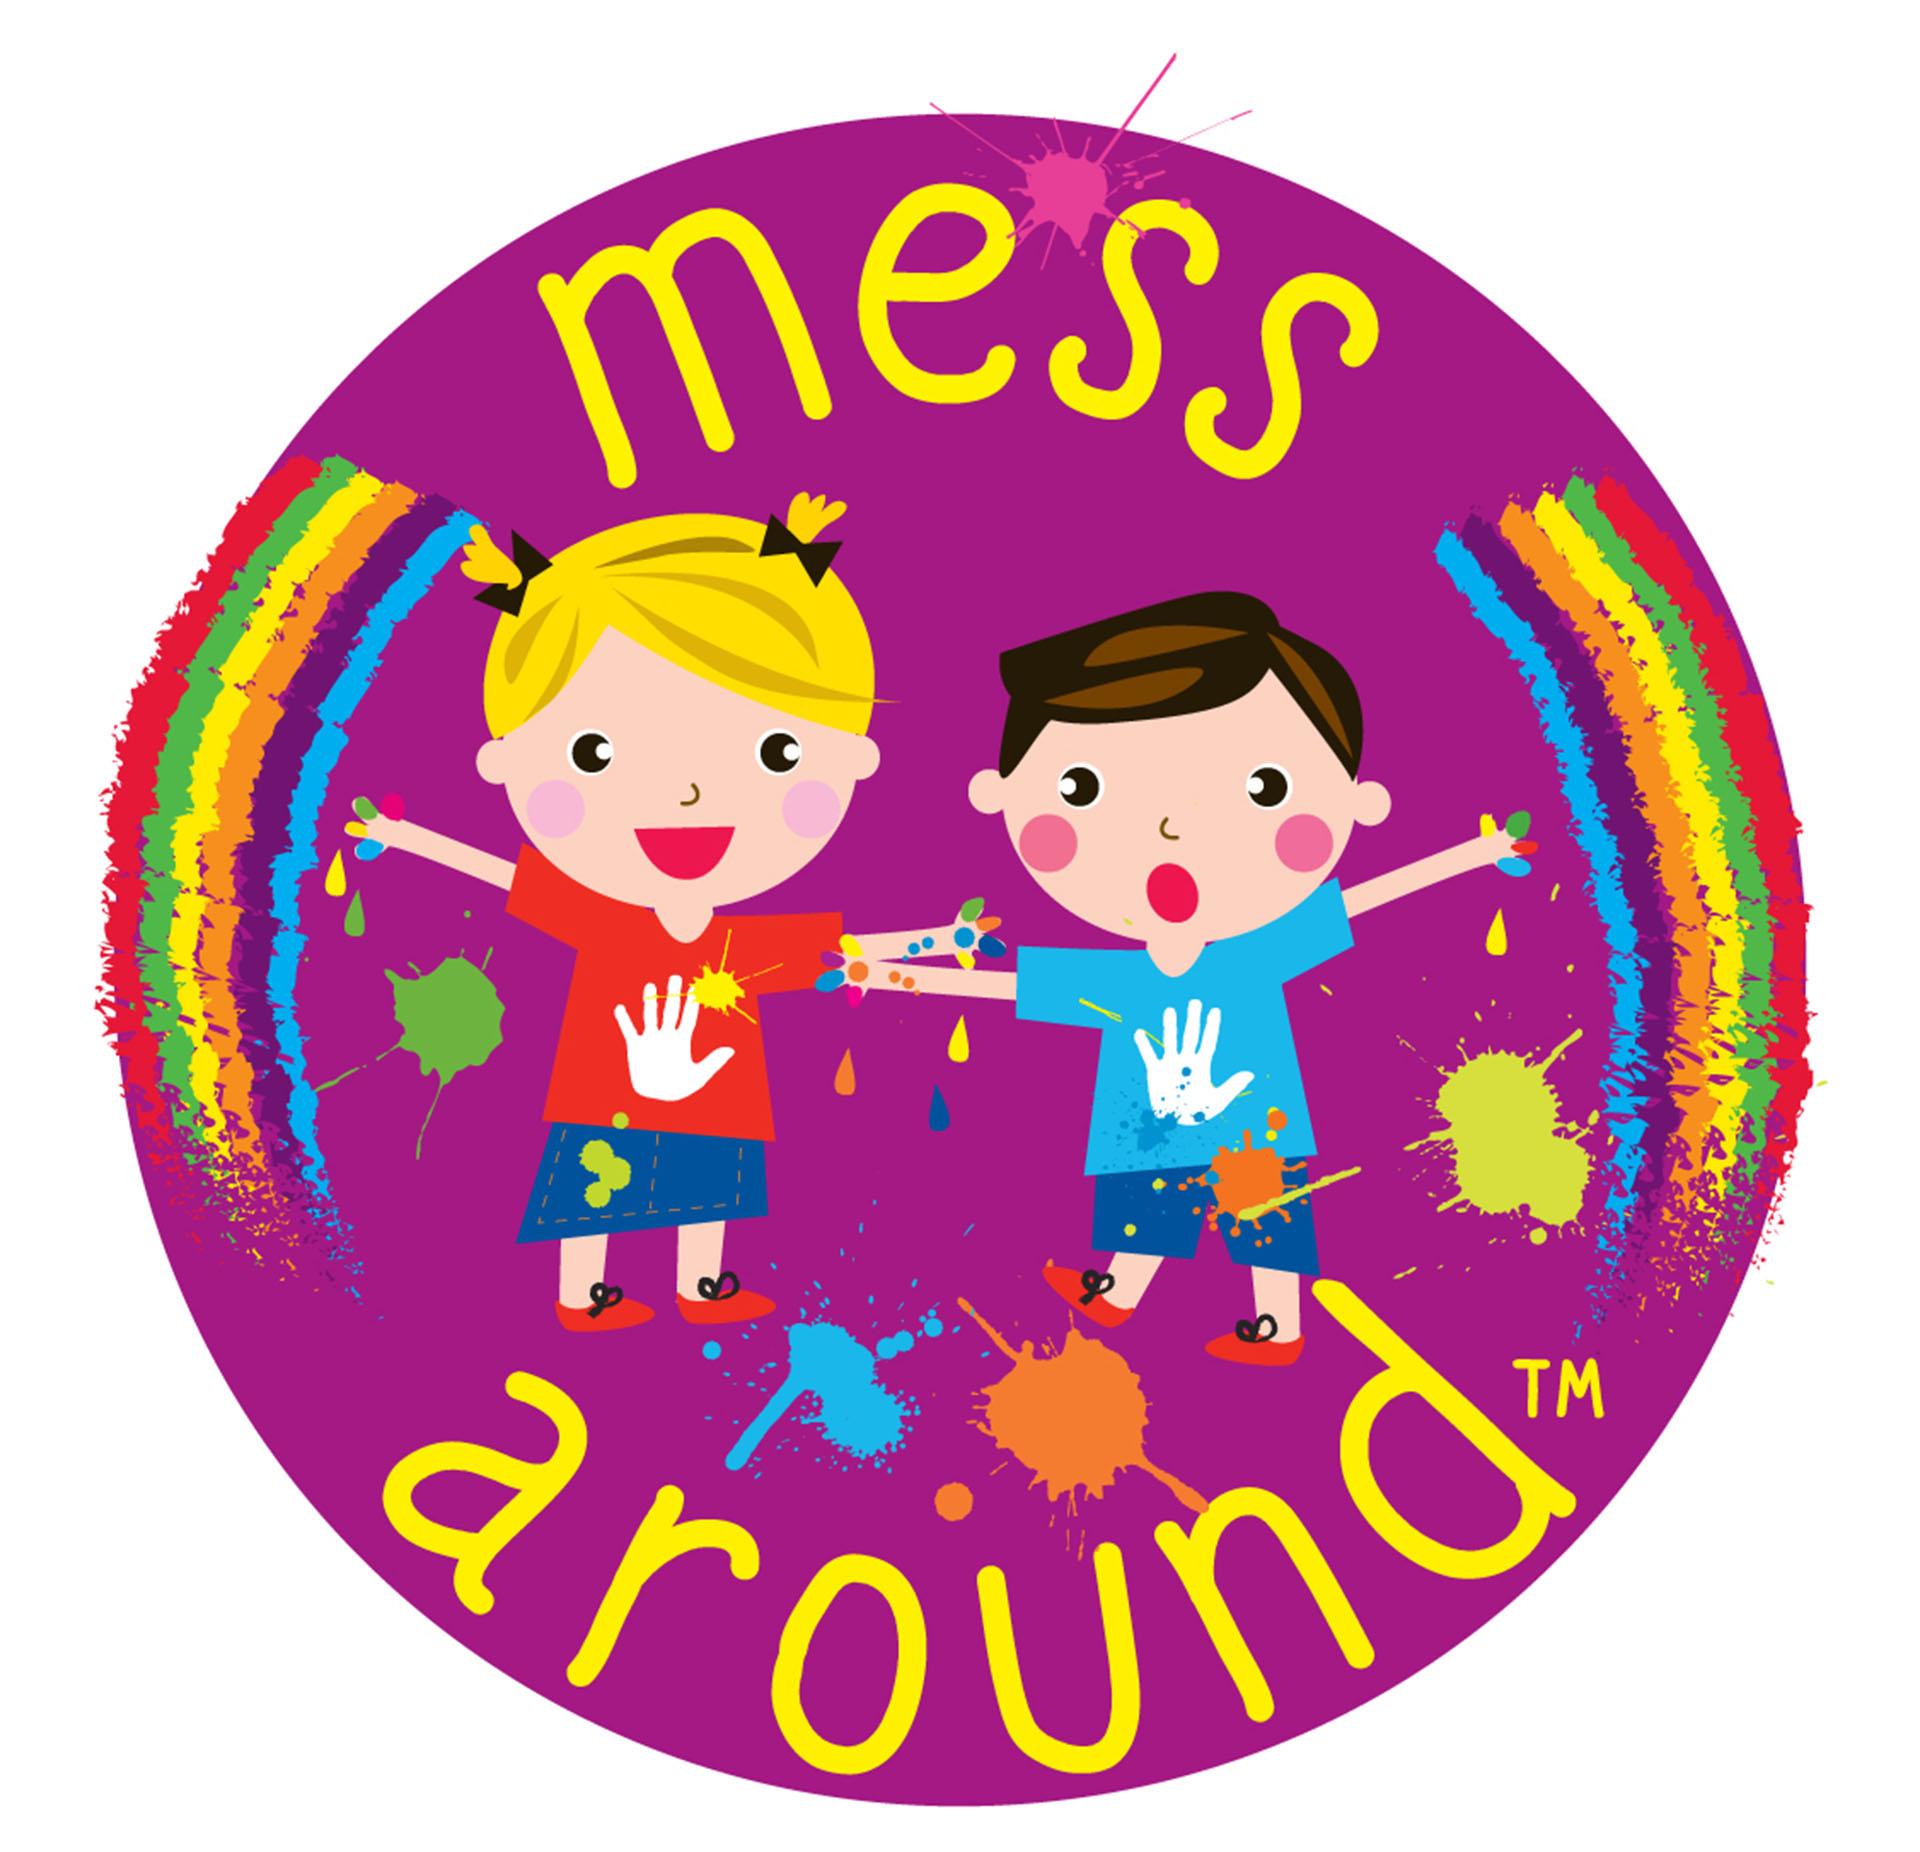 Mess Around Nottingham's logo